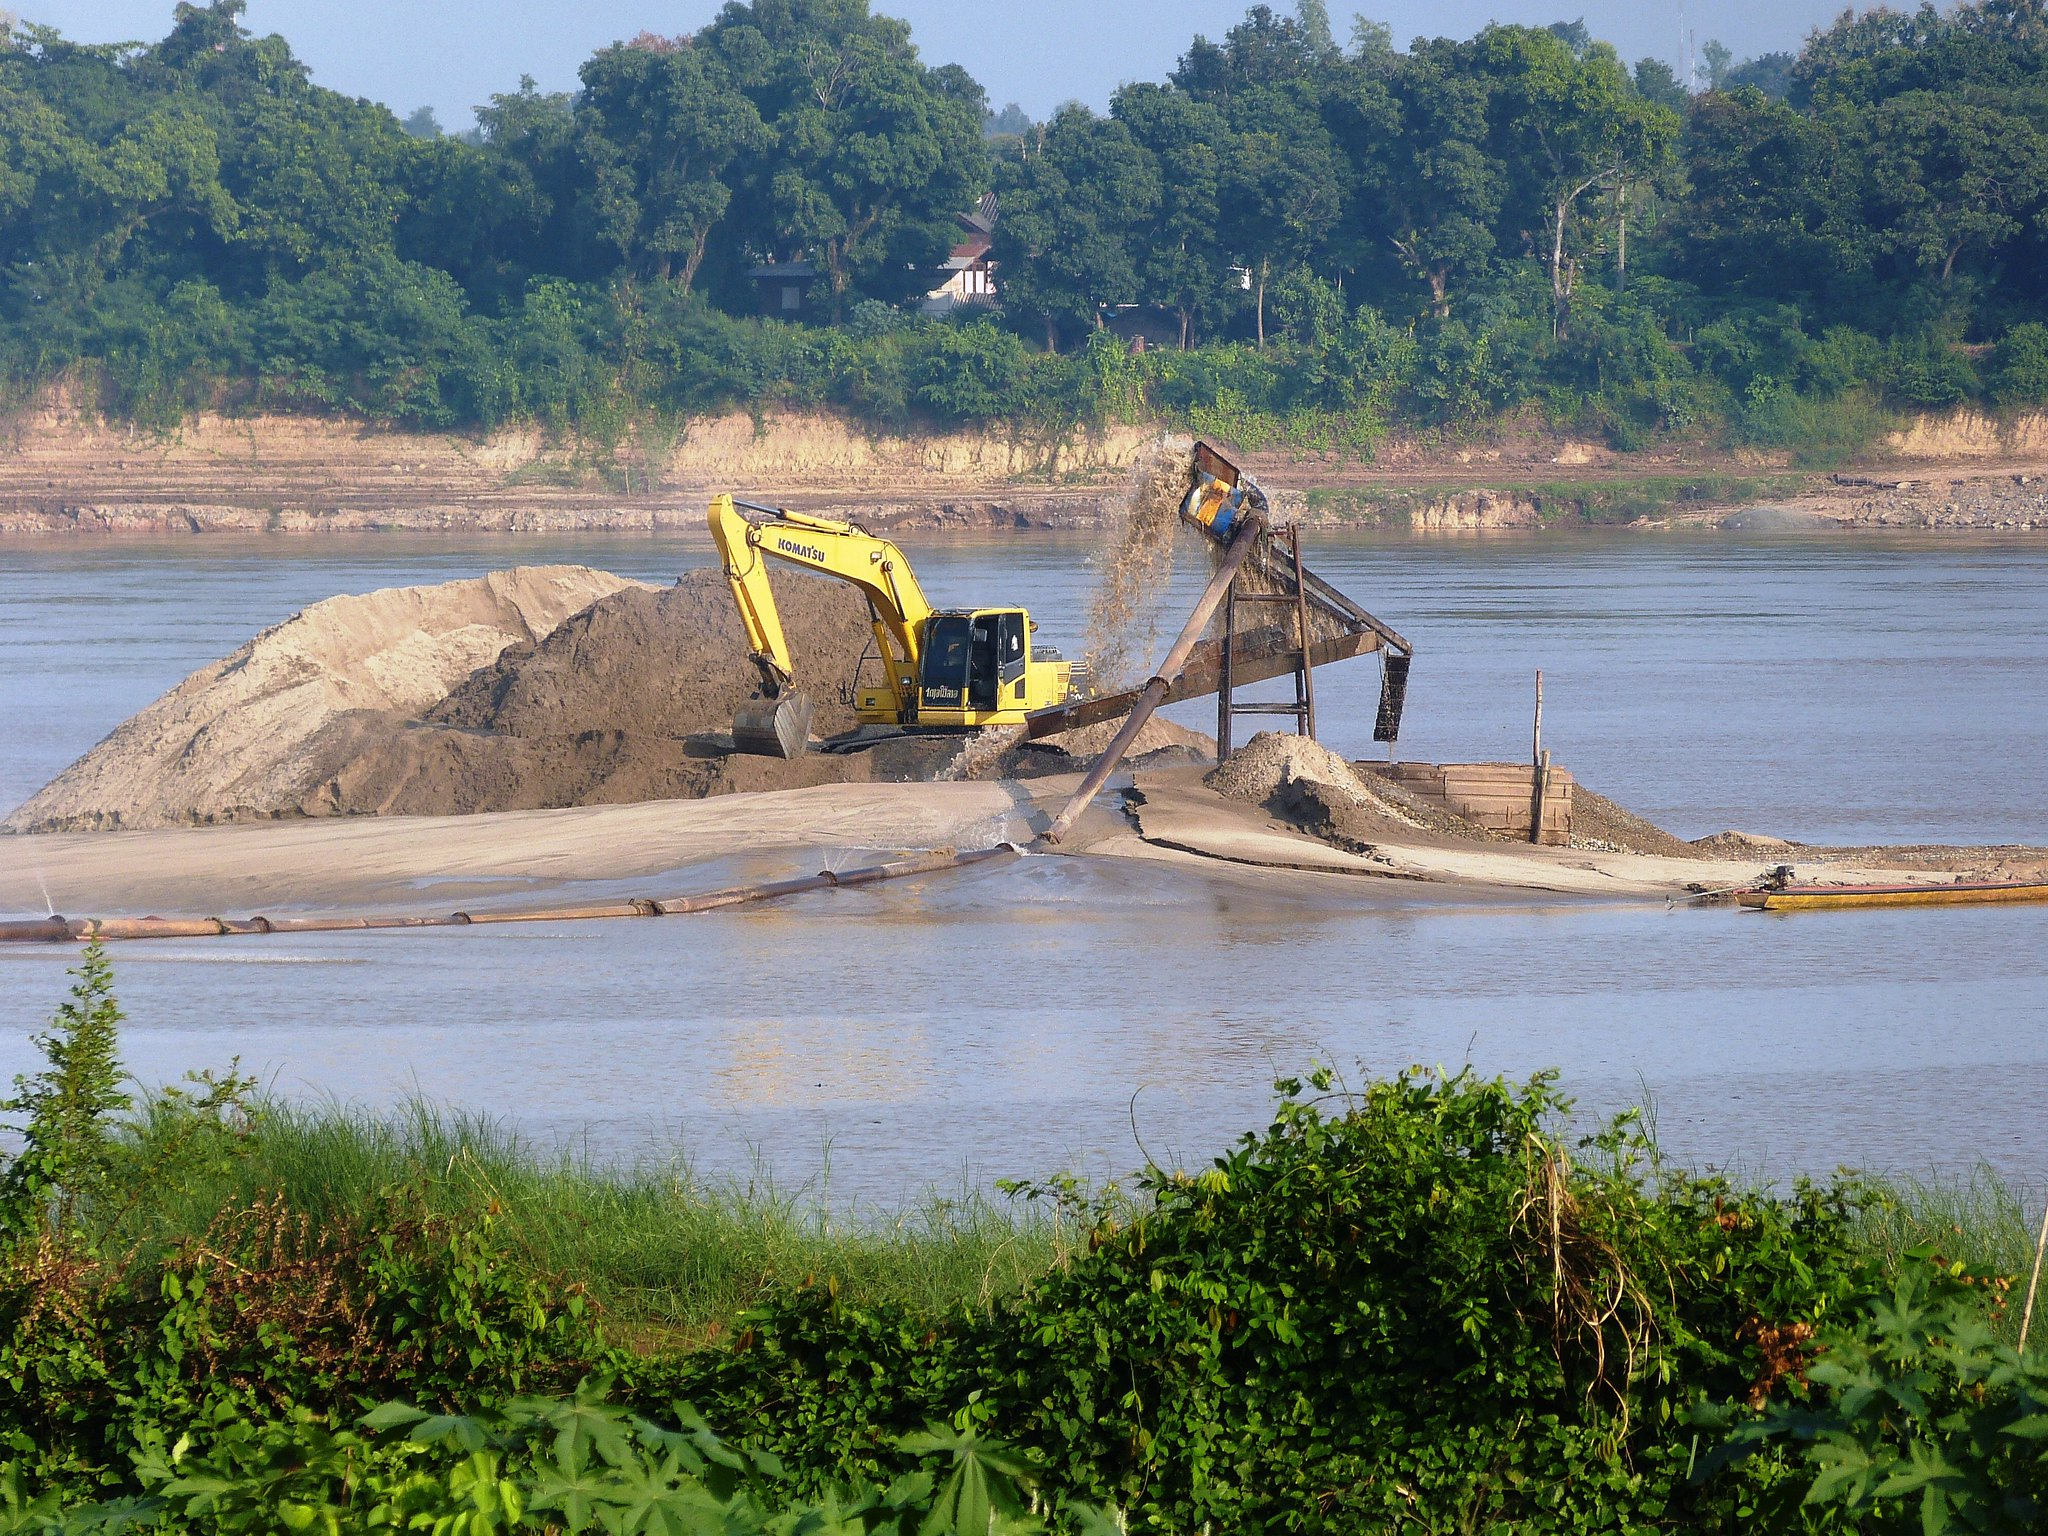 Estrazione sabbia sul fiume Mekong - Foto Flickr Creative Commons - Water Alternative Photos